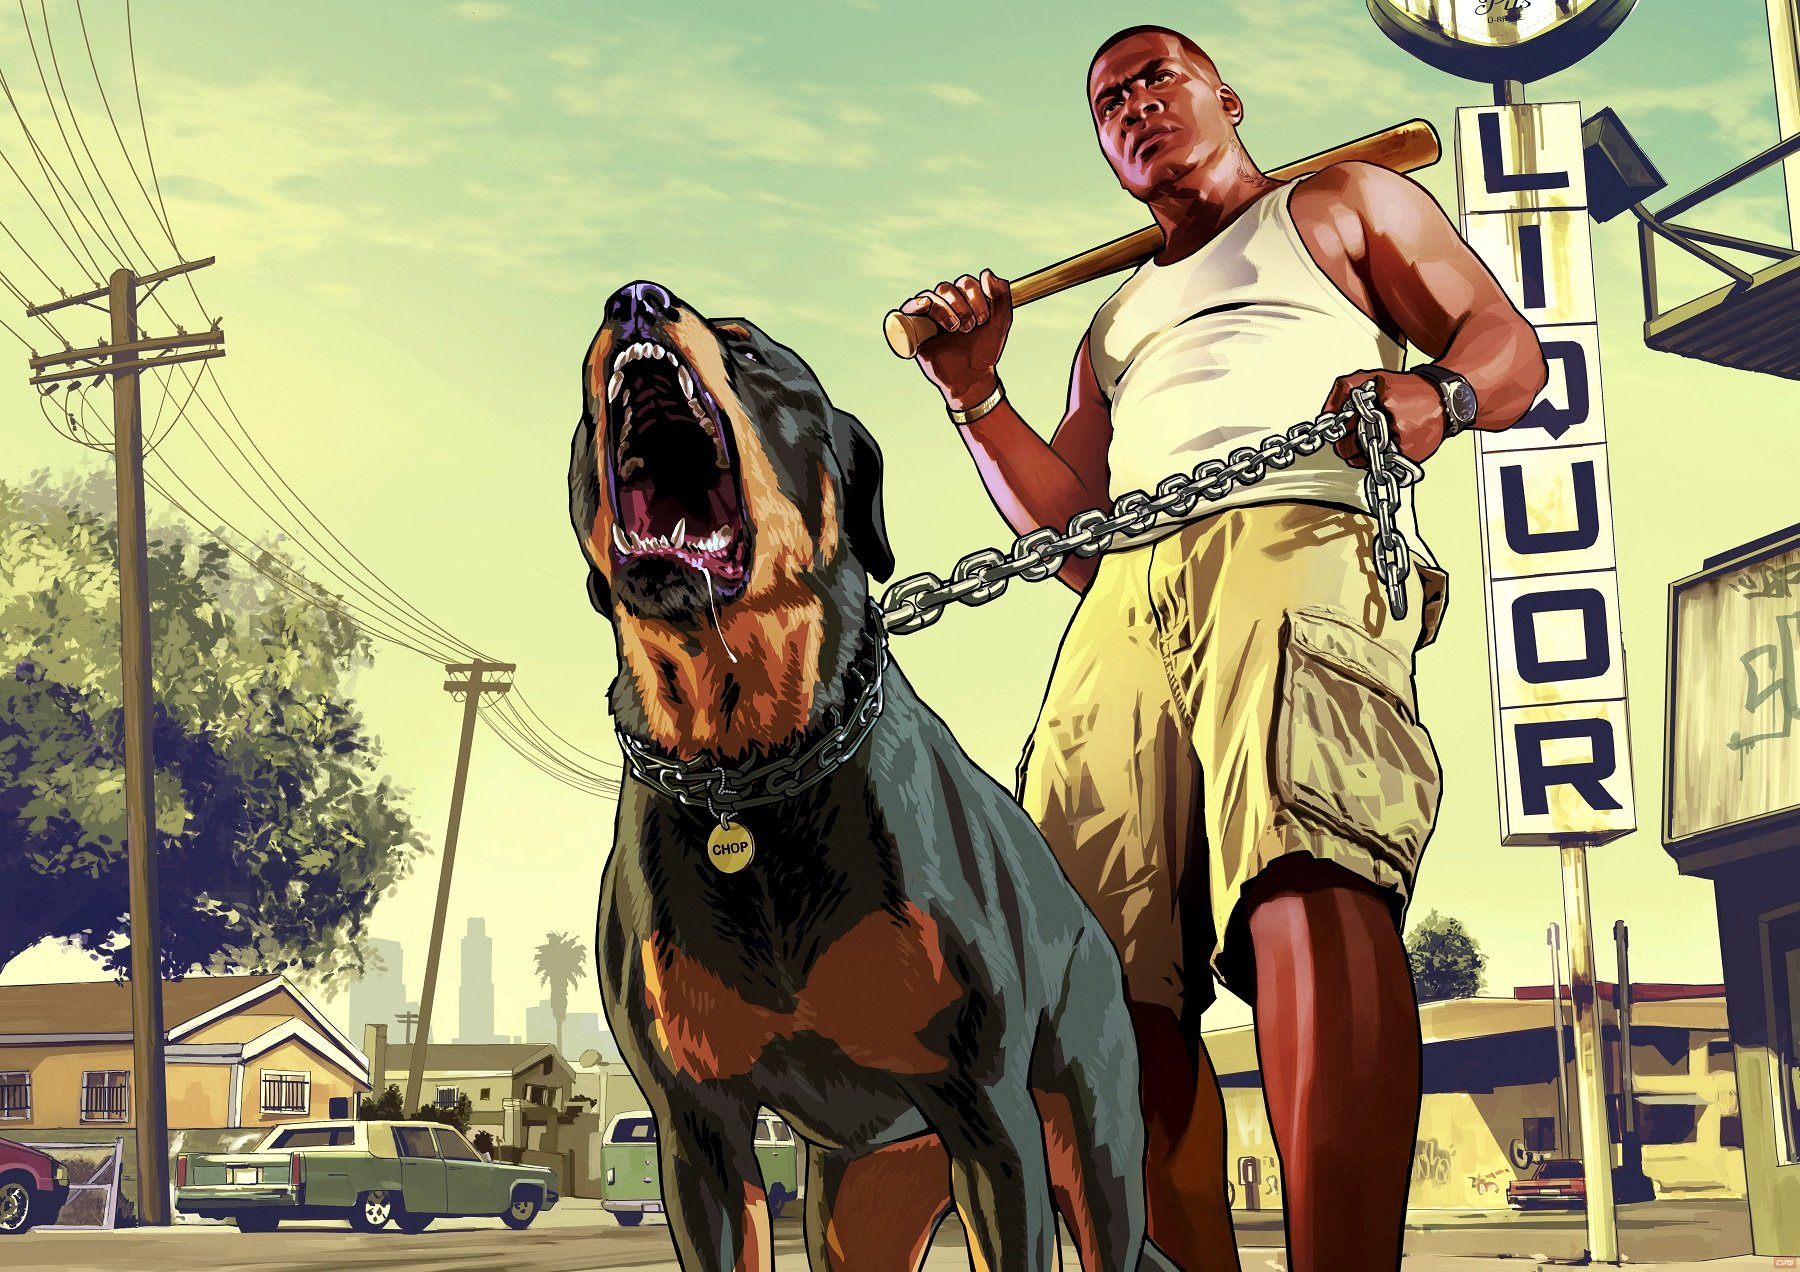 GTA 5's Franklin holding a baseball bat and a dog on a chain leash